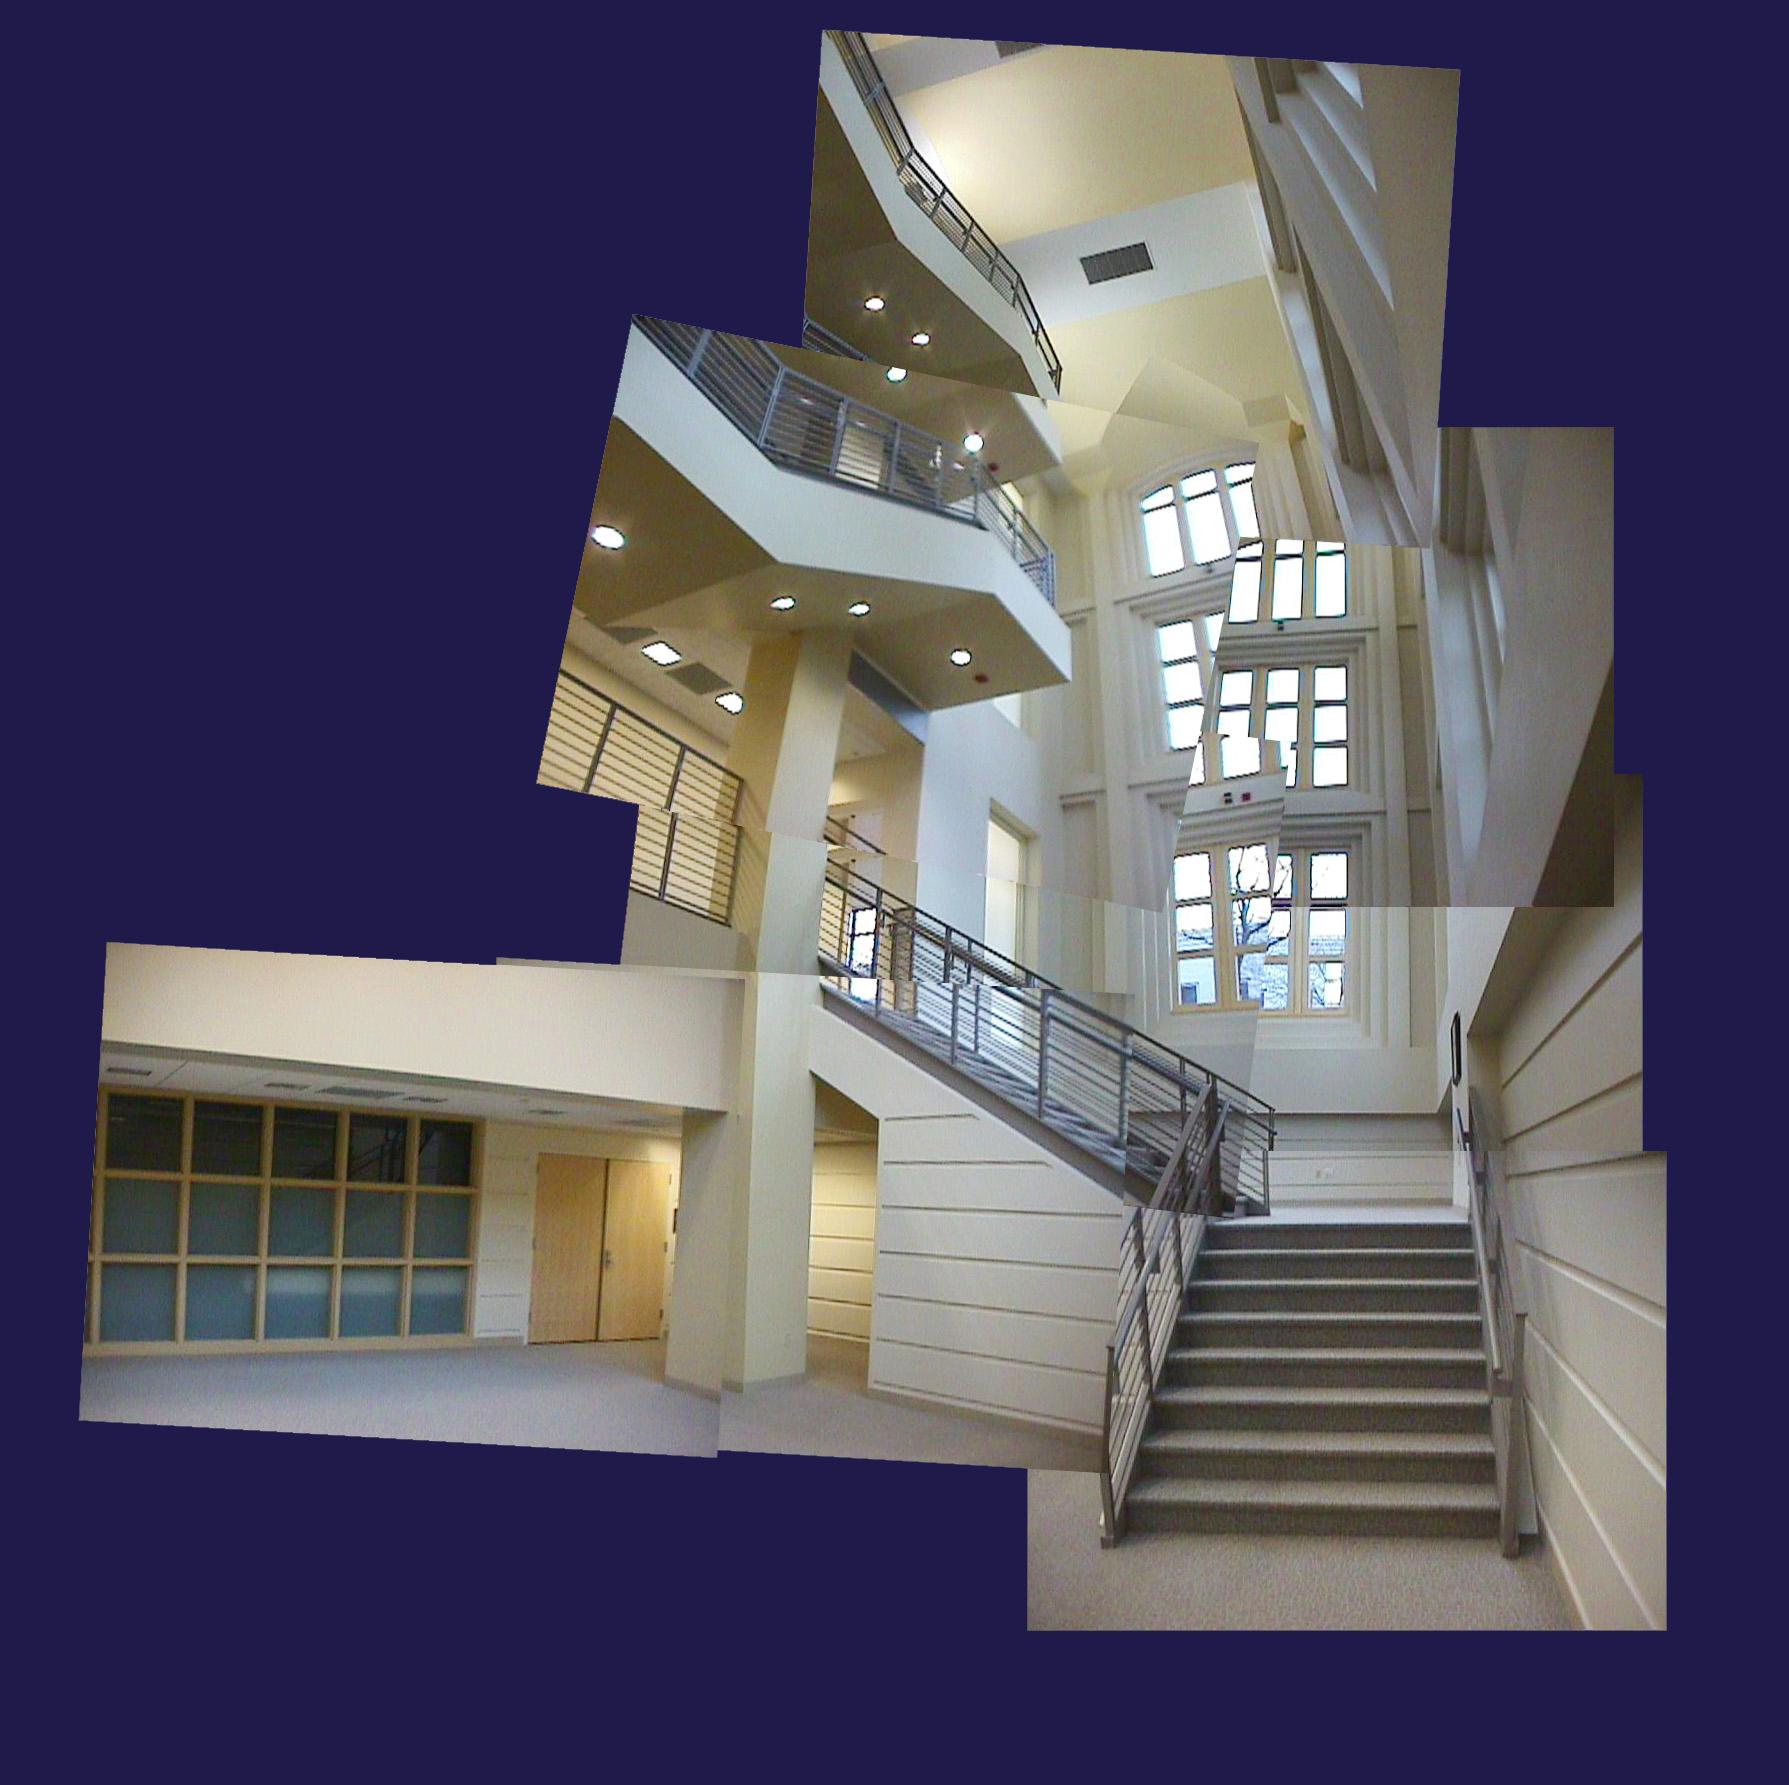 pho-int-atrium flat-300ppi-6x6.jpg